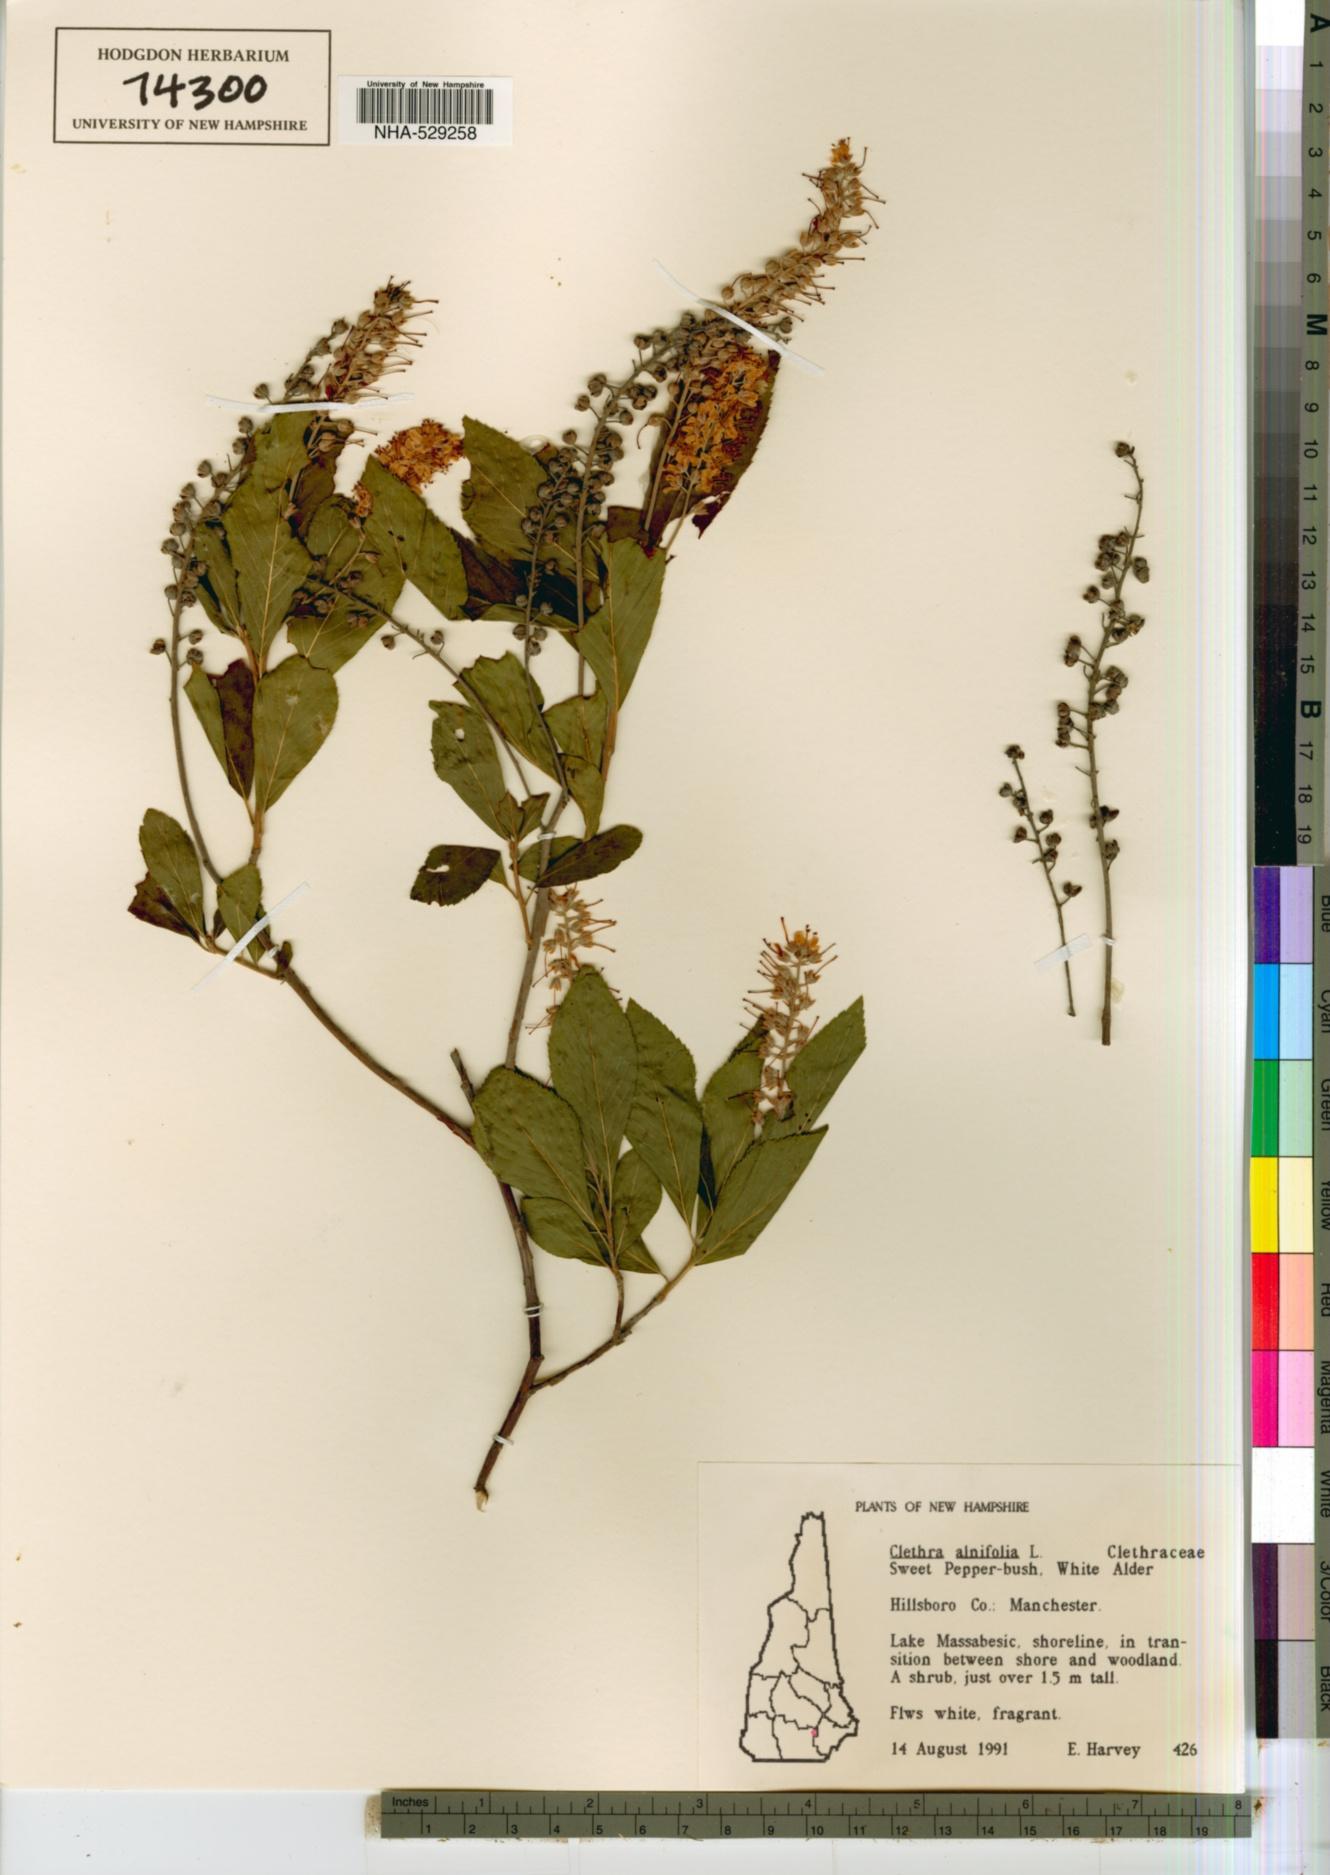 Clethraceae image